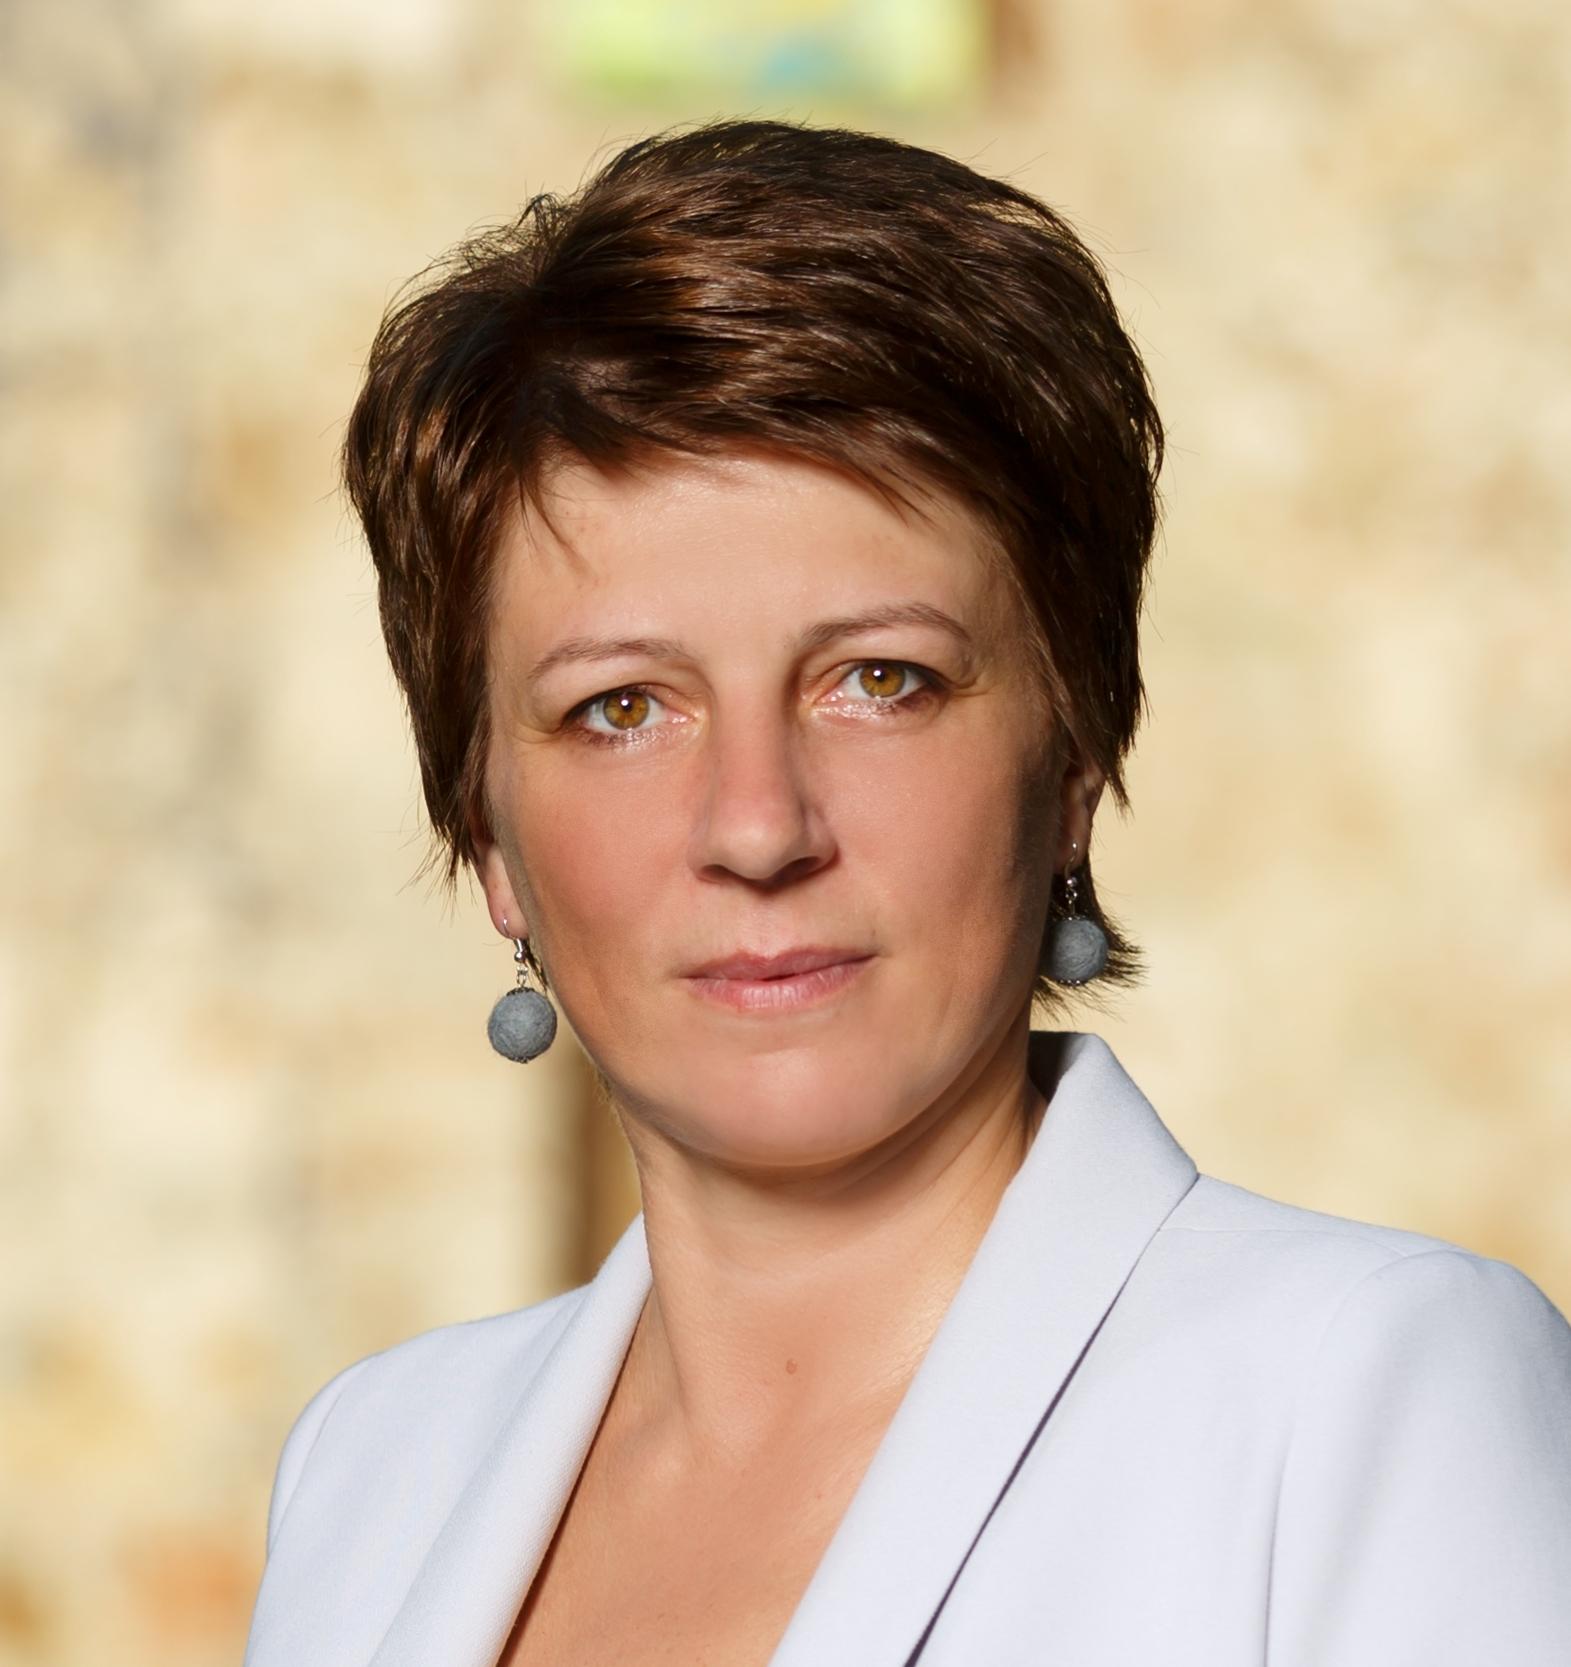 Daniela Galandová